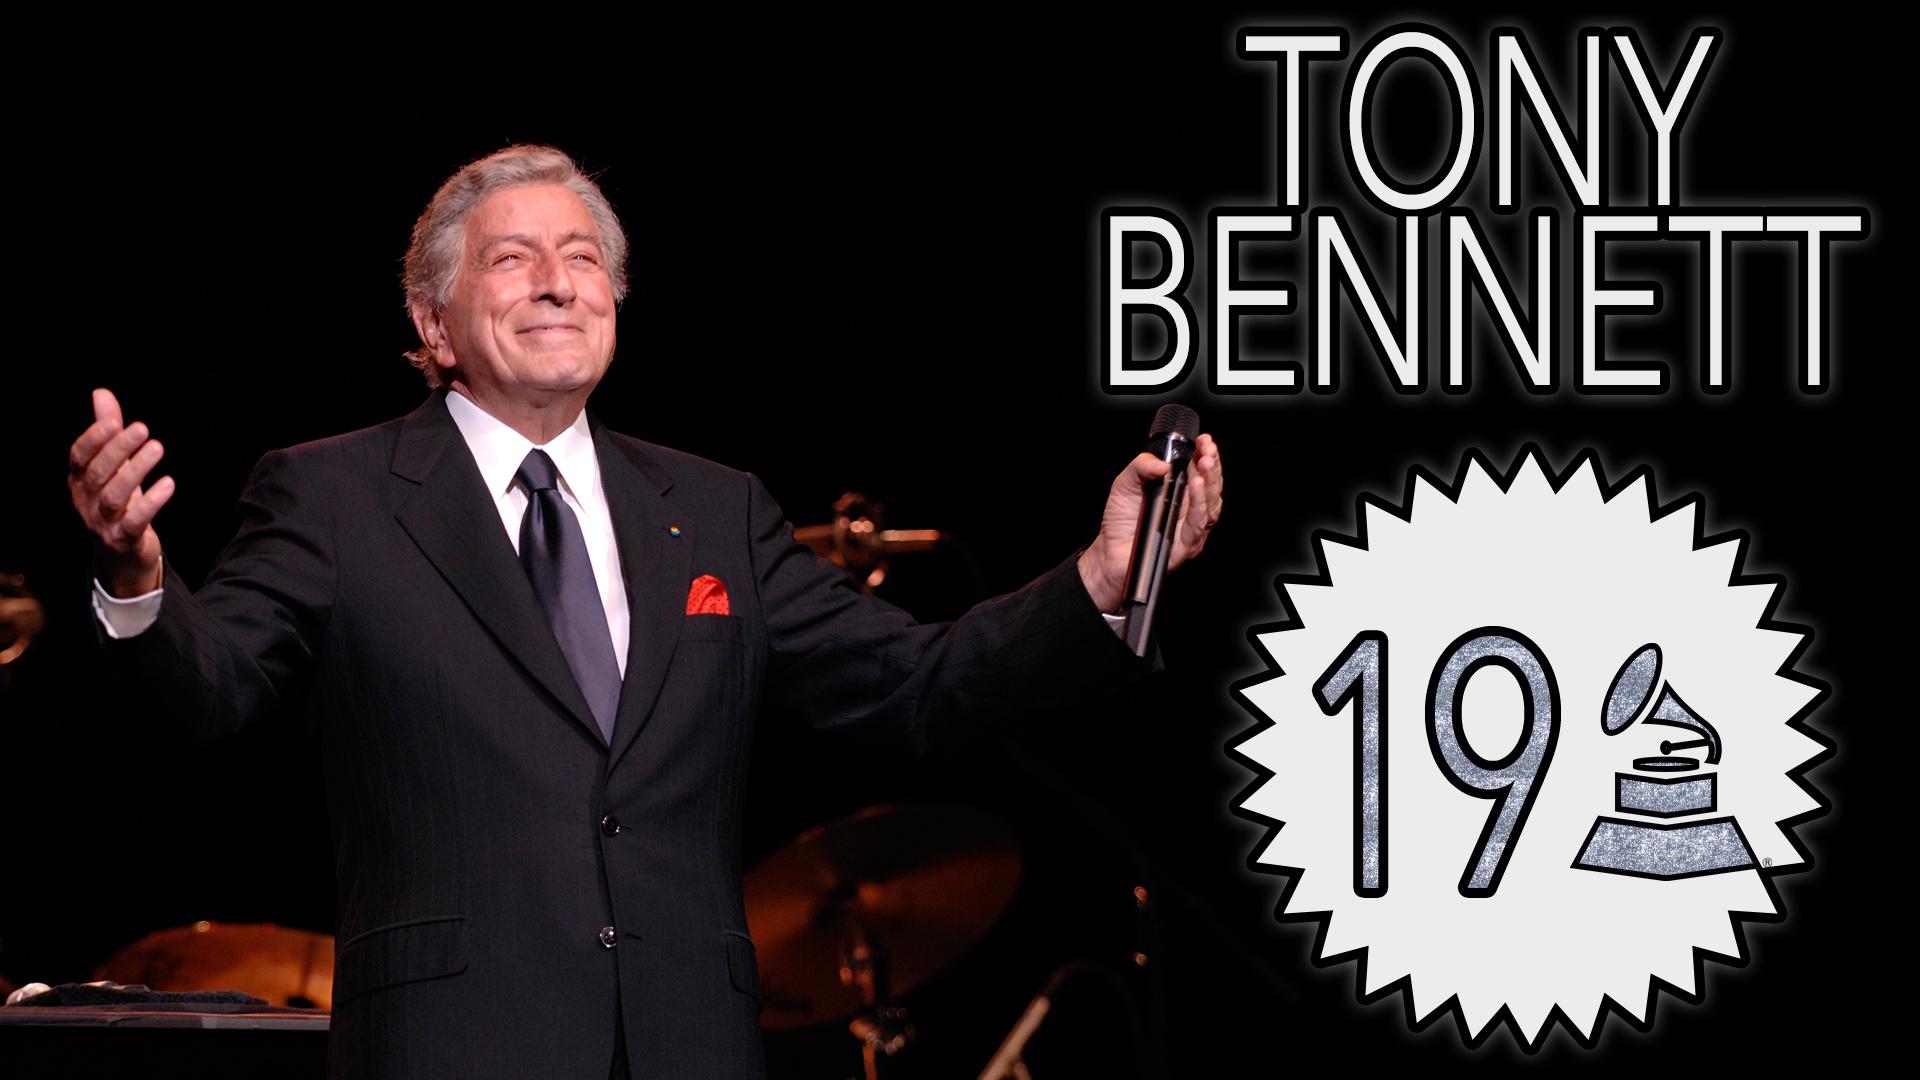 Tony Bennett with 19 GRAMMY Awards